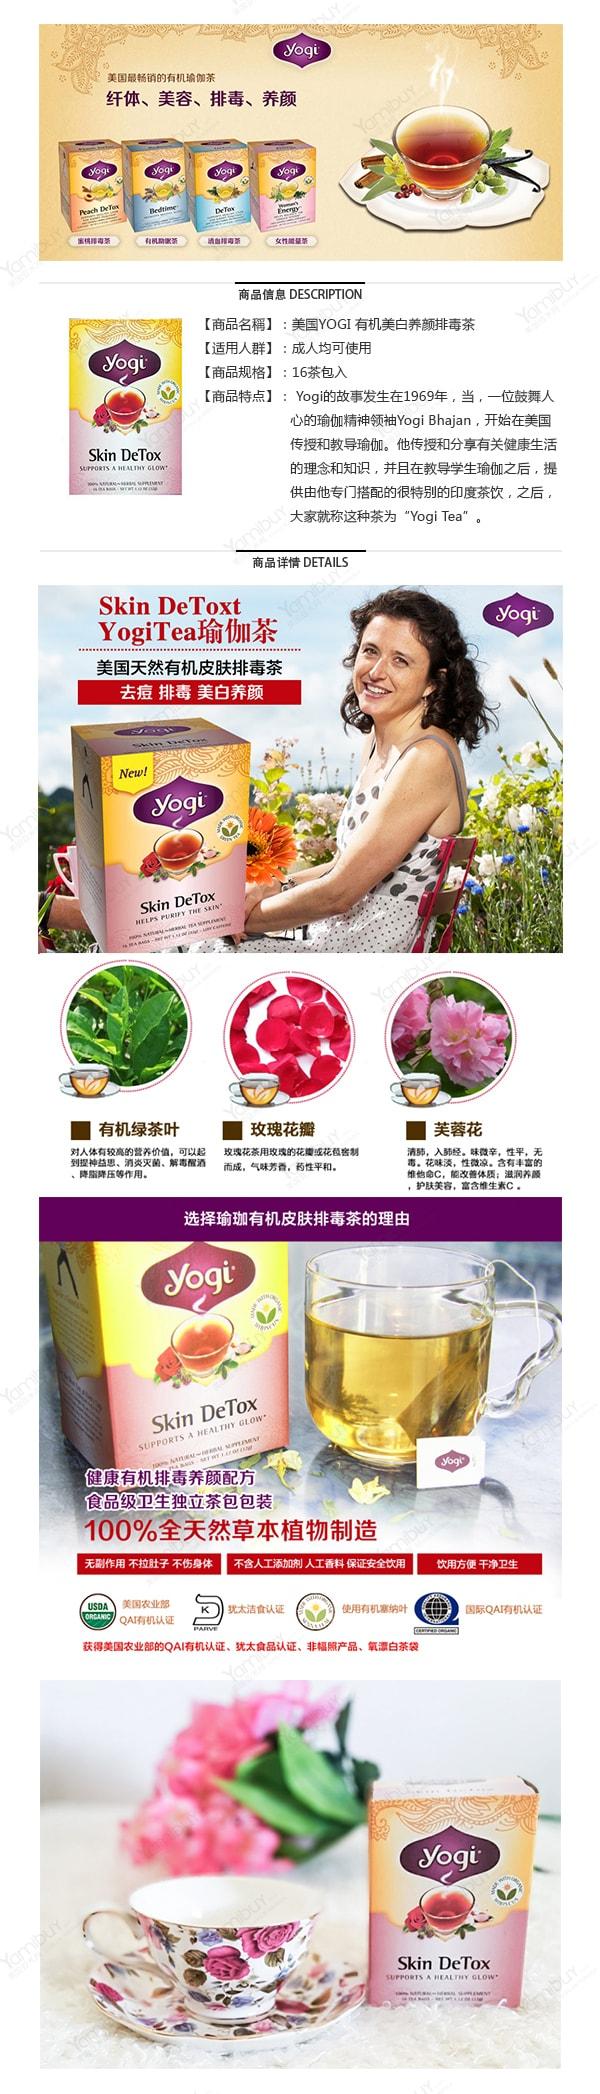 YOGI Skin DeTox Tea 16pc Caffeine Free - Yamibuy.com